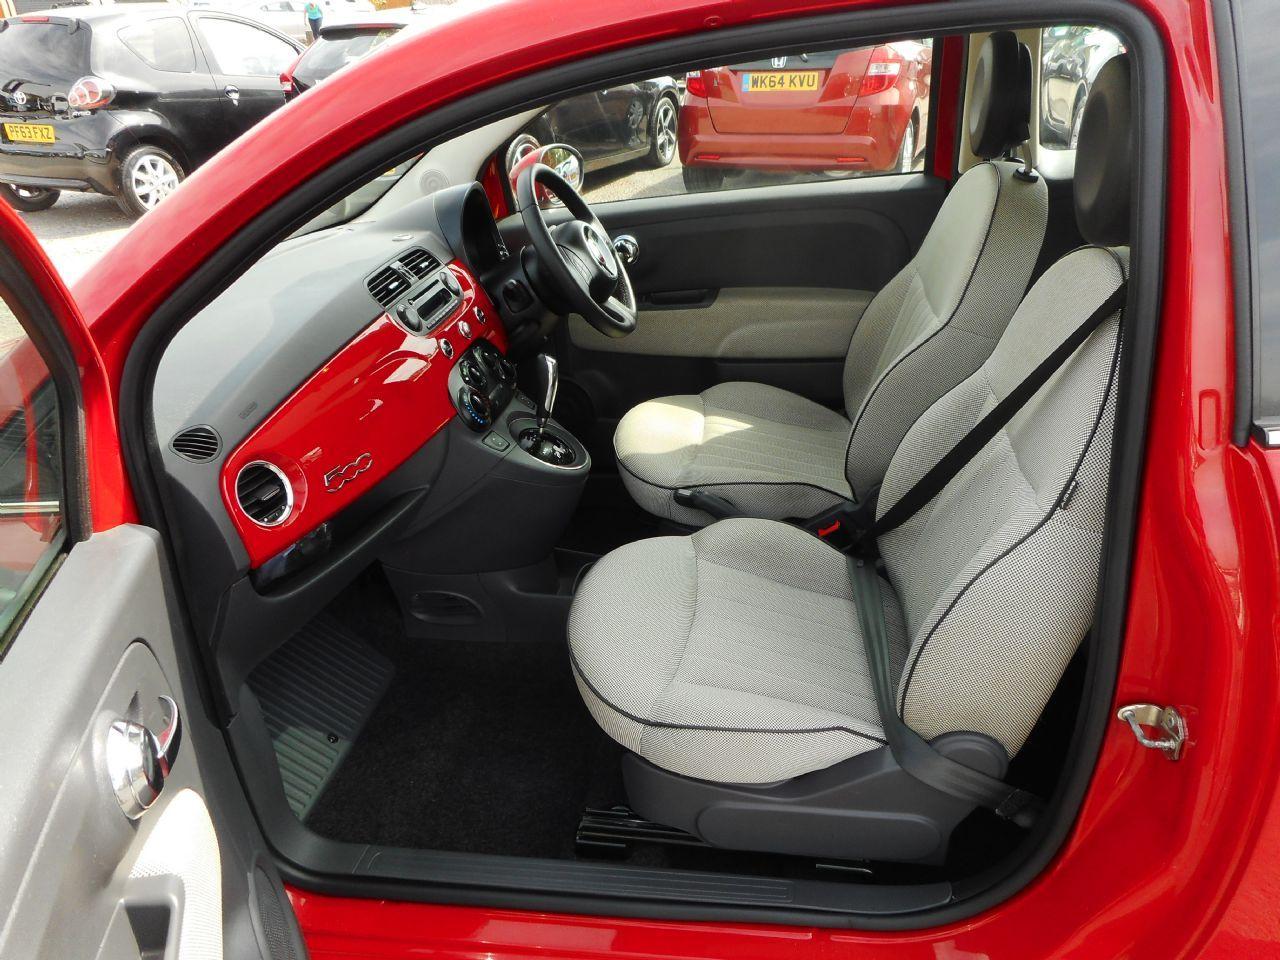 FIAT 500 1.2i Lounge S/S AUTO (2011) - Picture 11